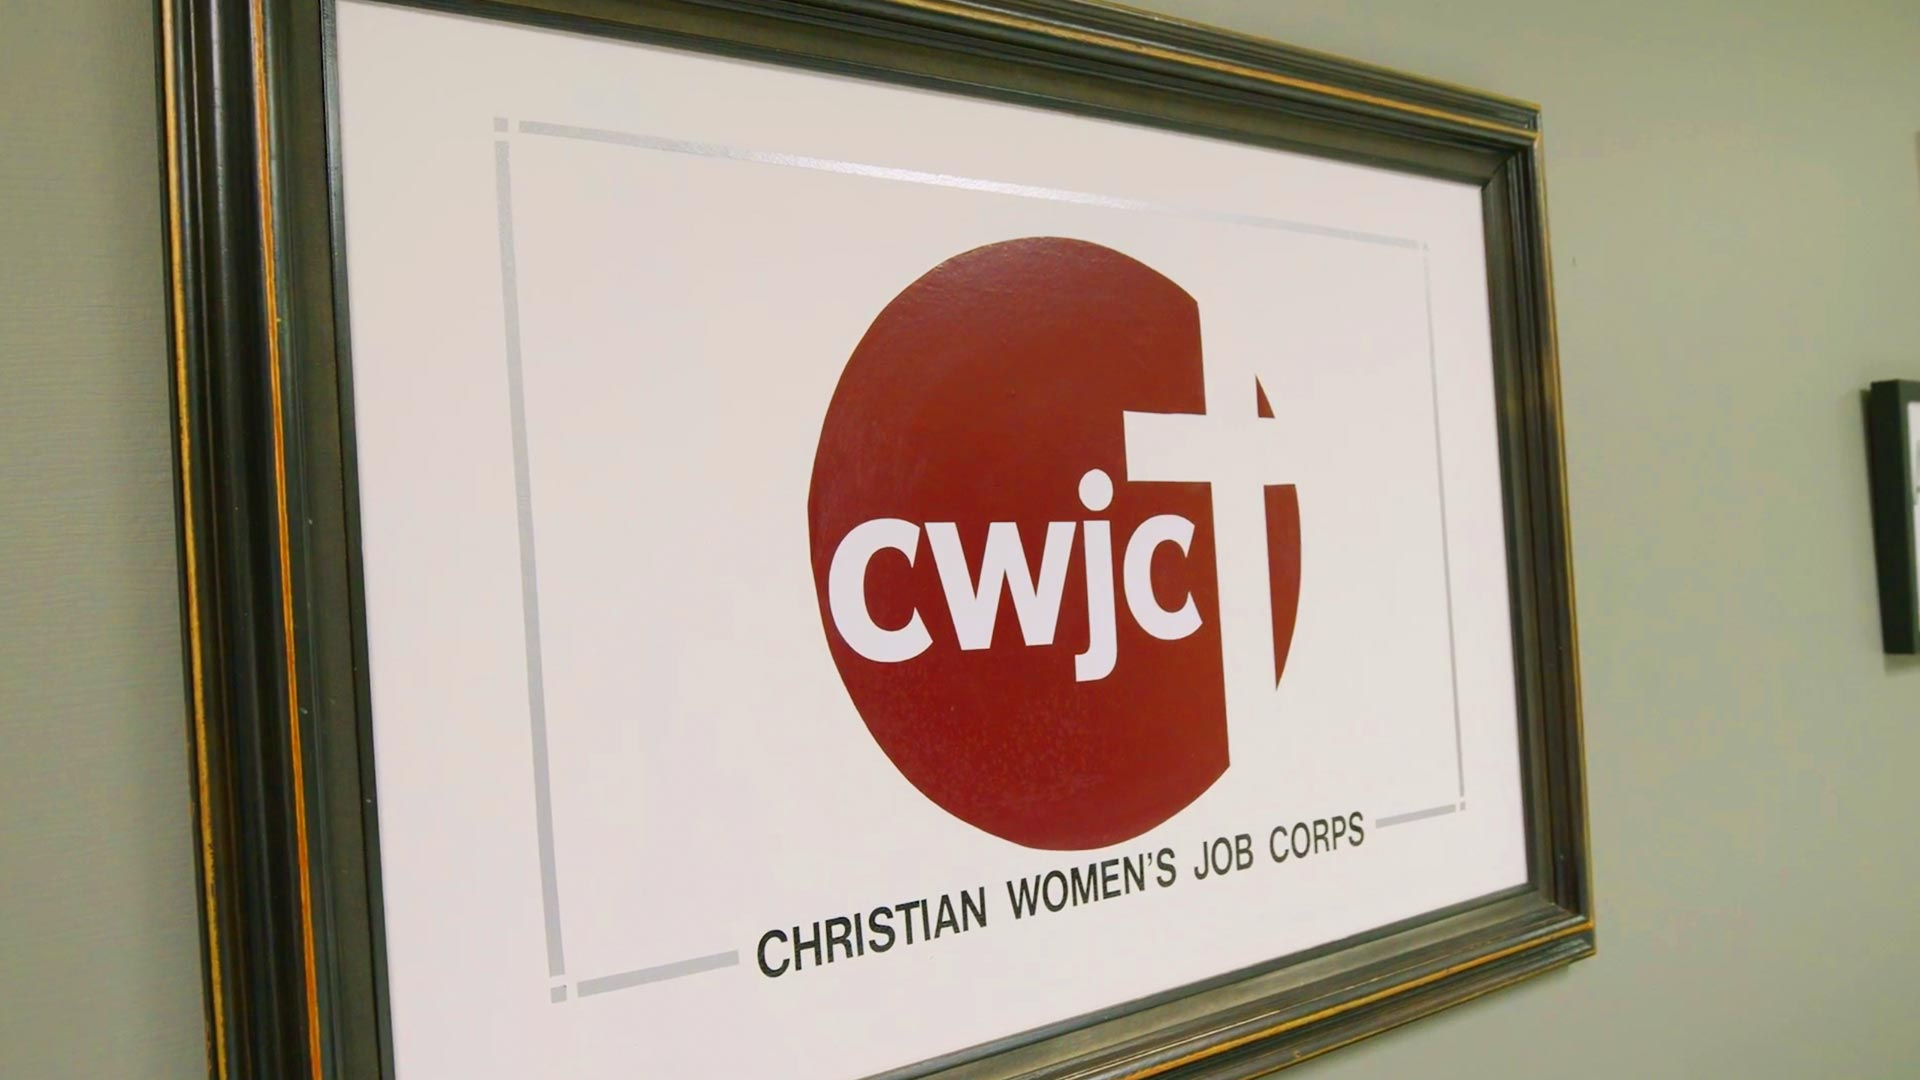 Christian Women's Job Corps Promo